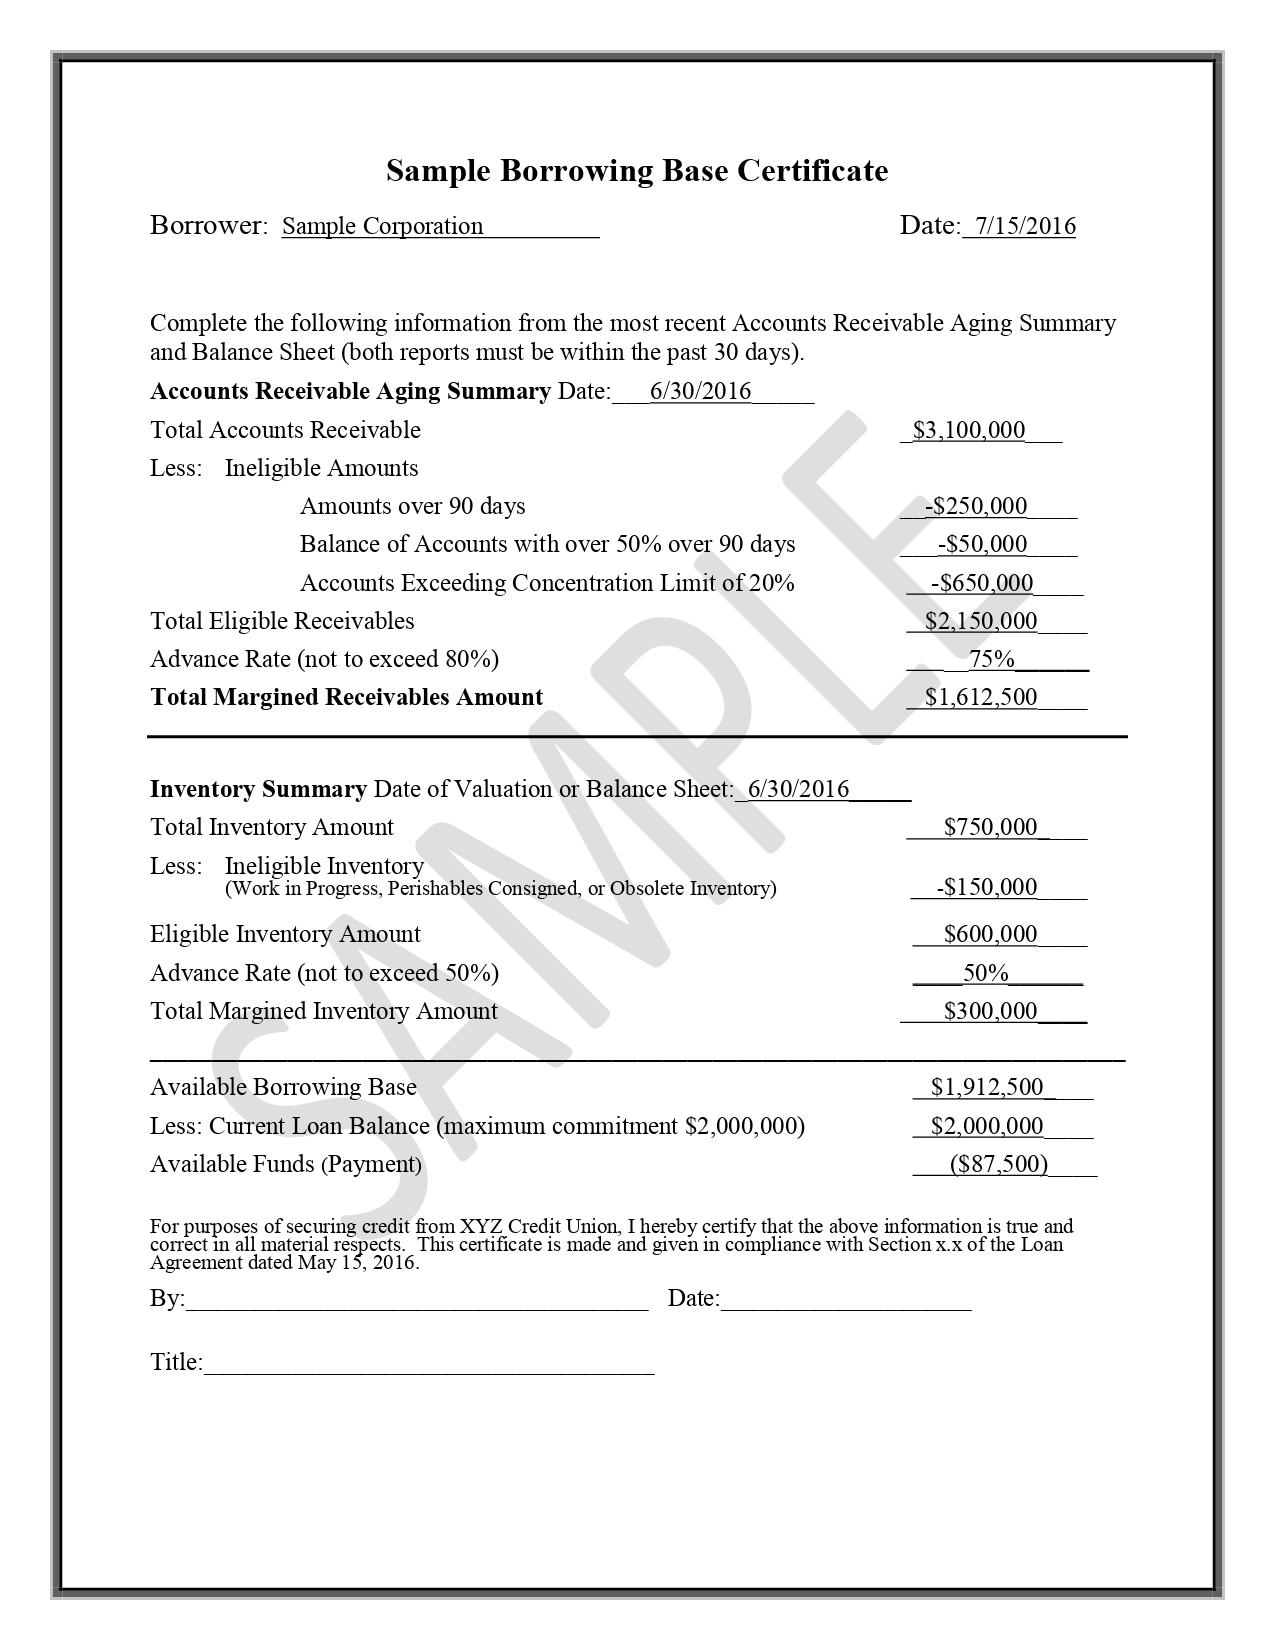 Sample Borrowing Base Certificate